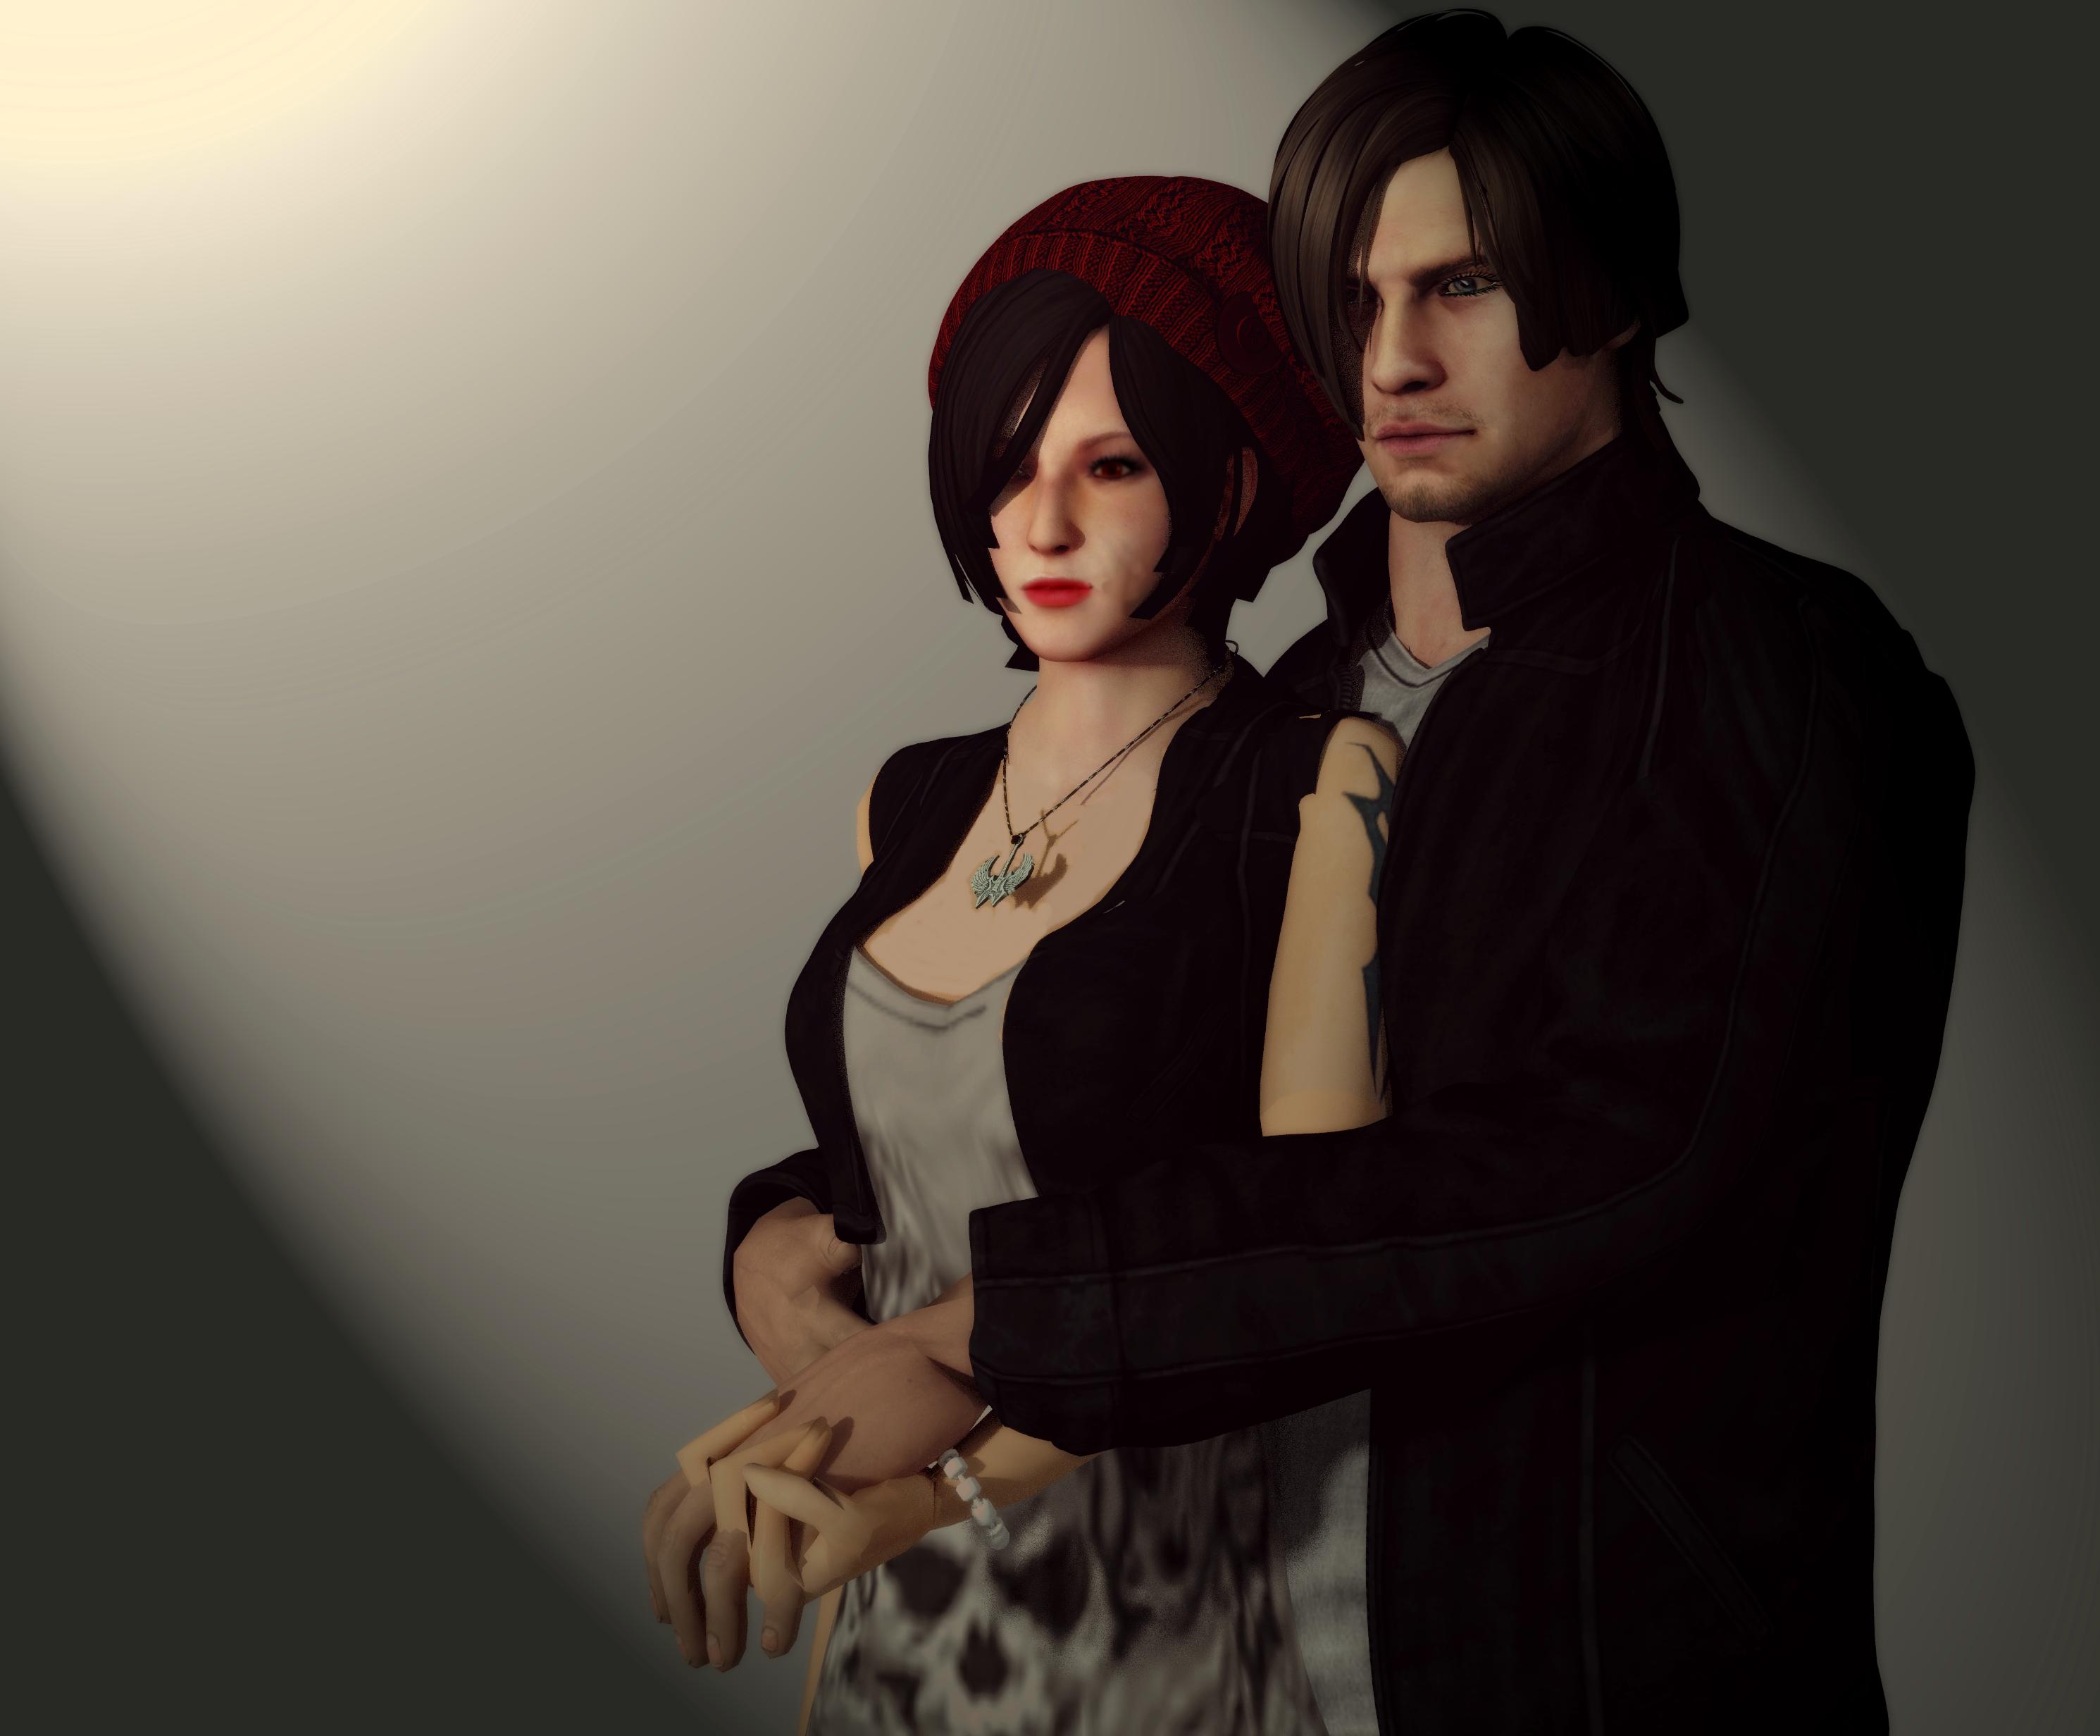 leon and ada relationship quiz